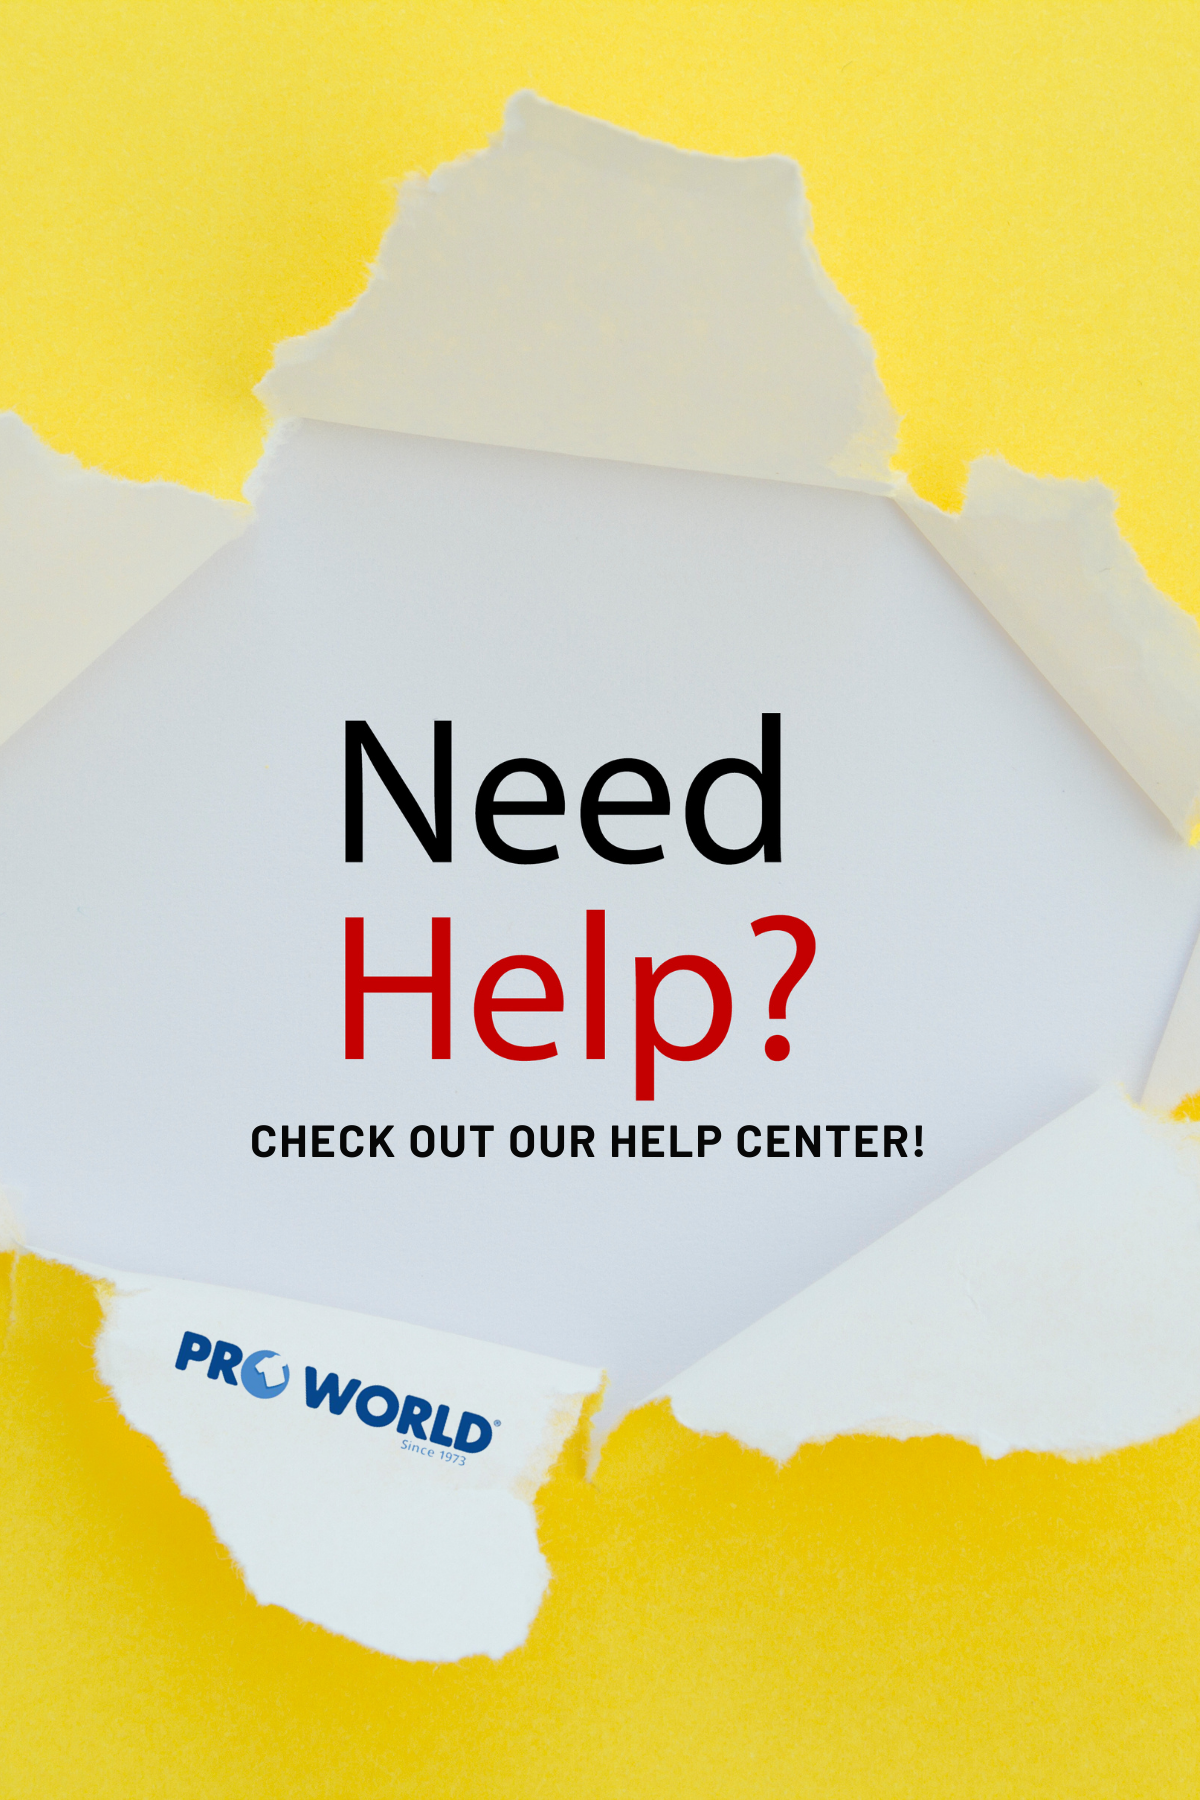 pro world help center